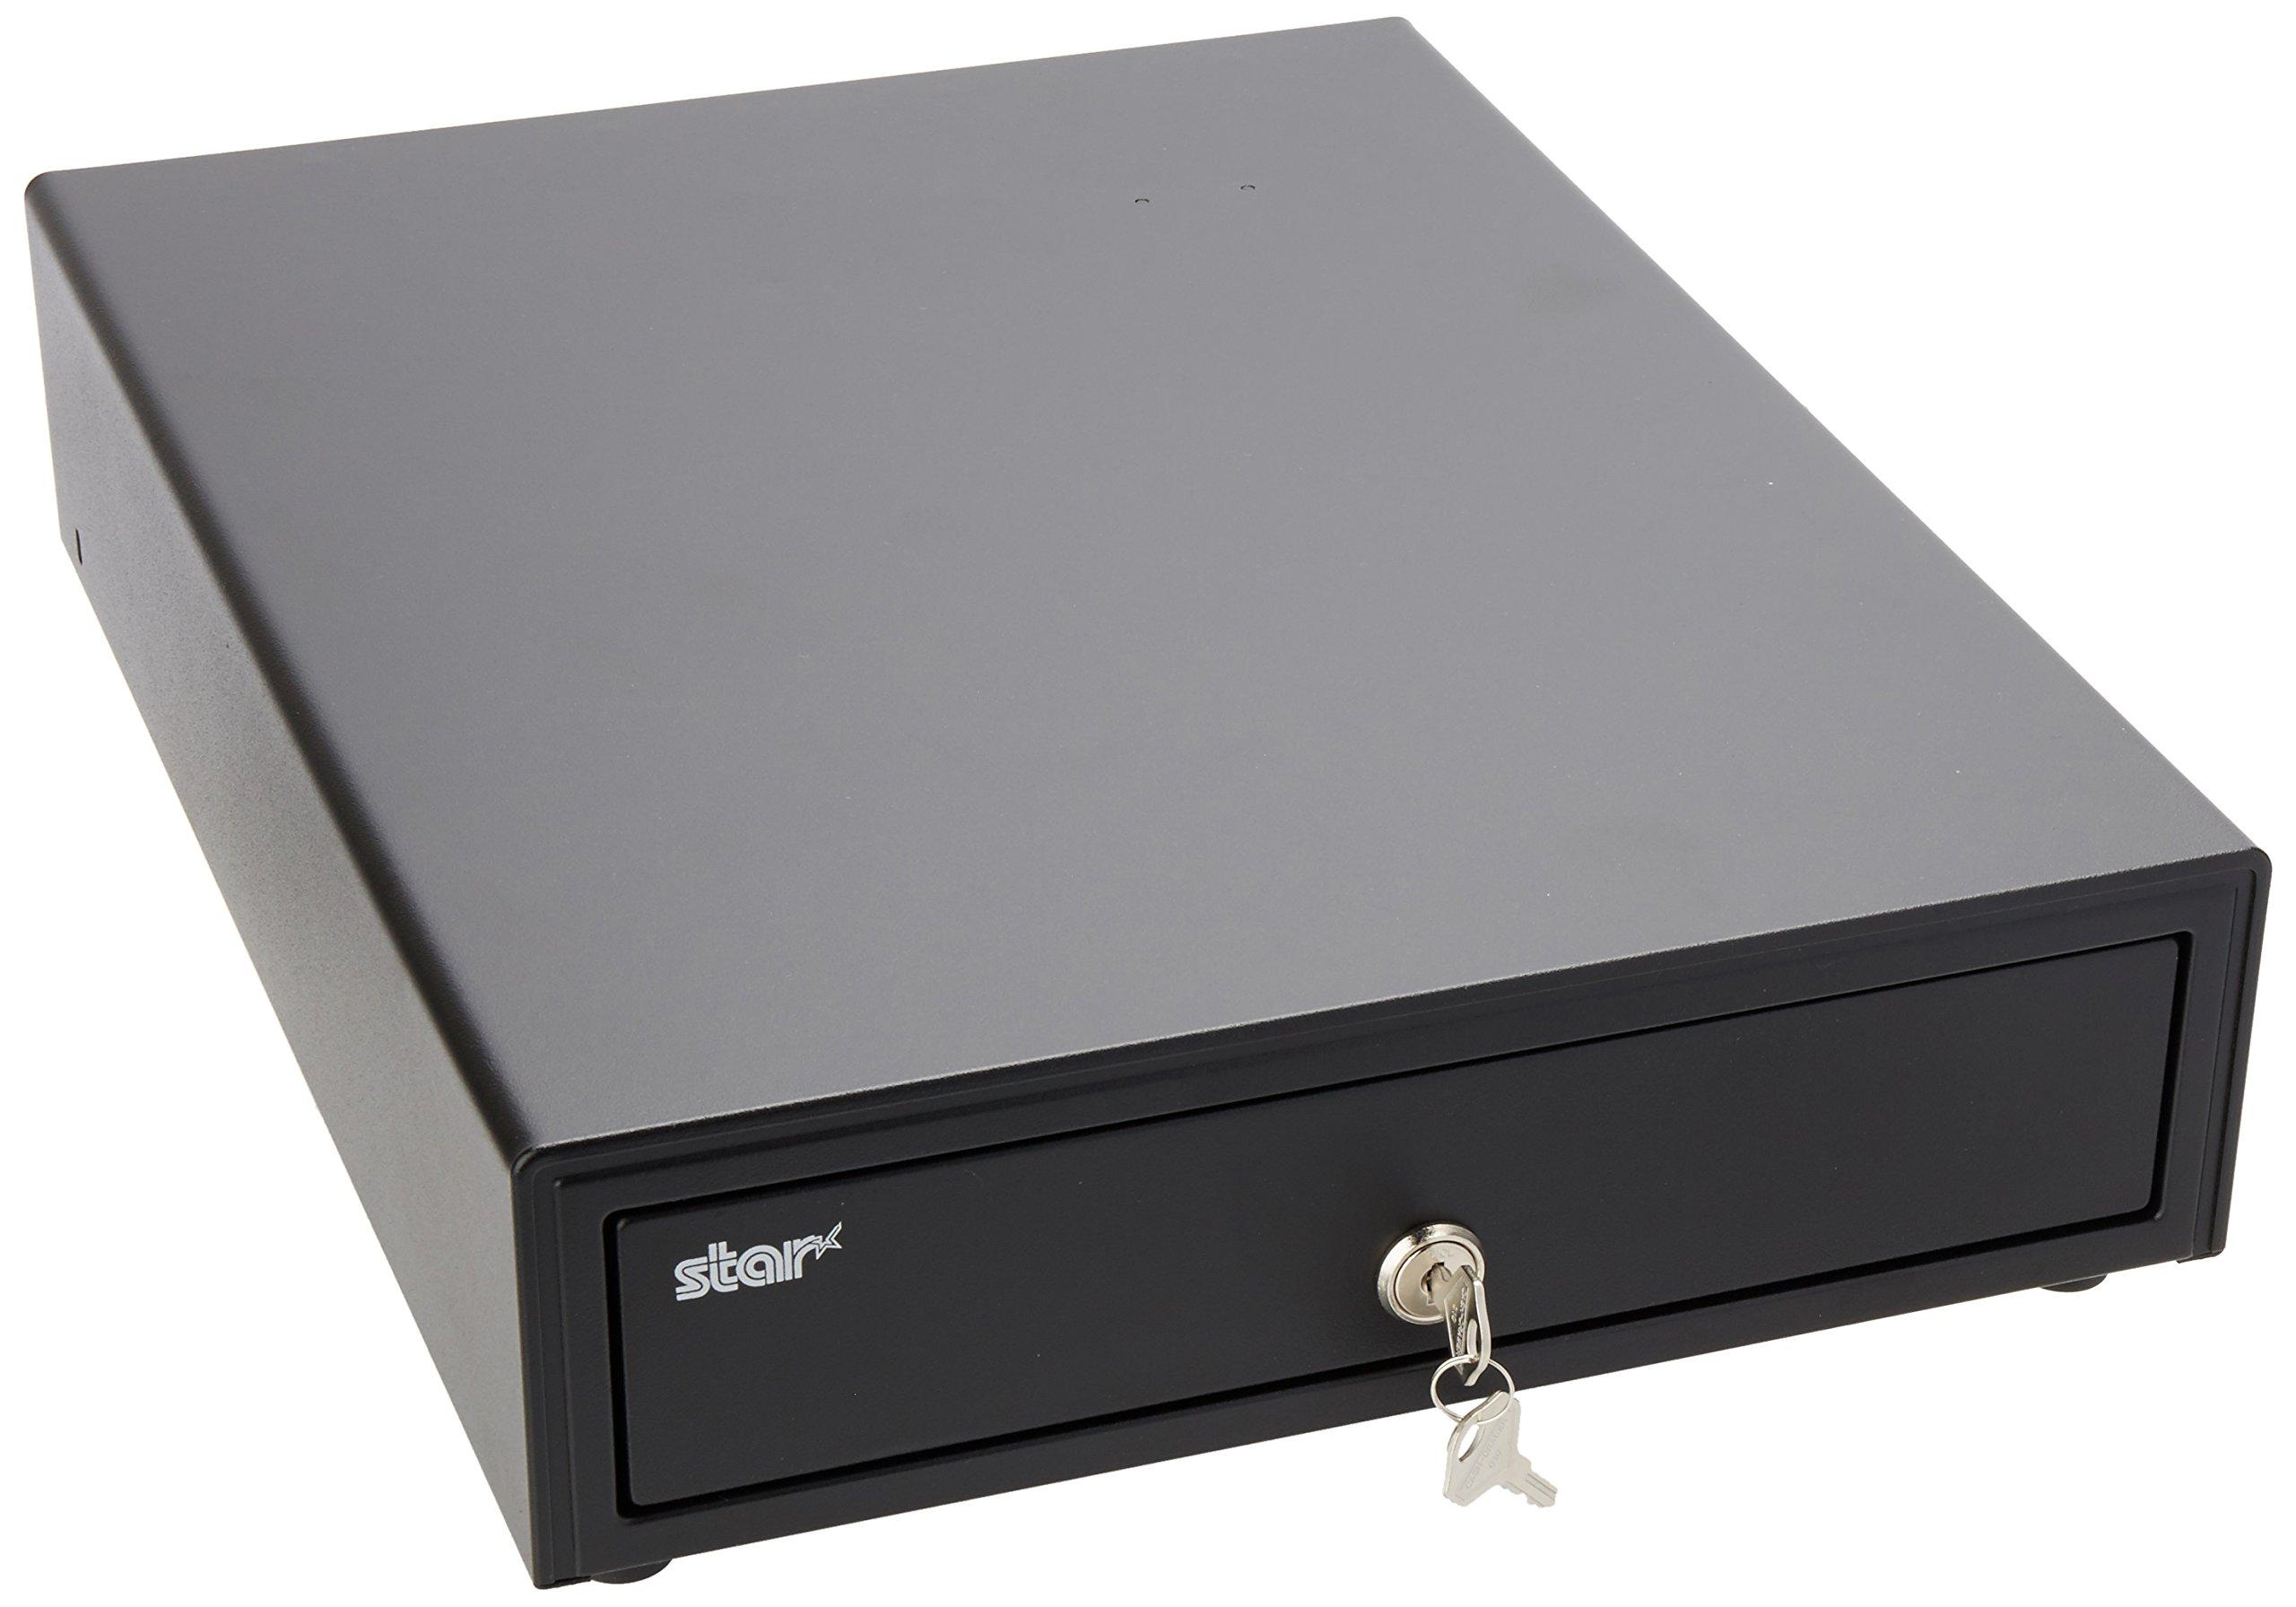 Star Micronics, 37964220, Cash Drawer, 13'' x 17'', Printer Driven, 4 Bill/4 Coin, Black, Keys included